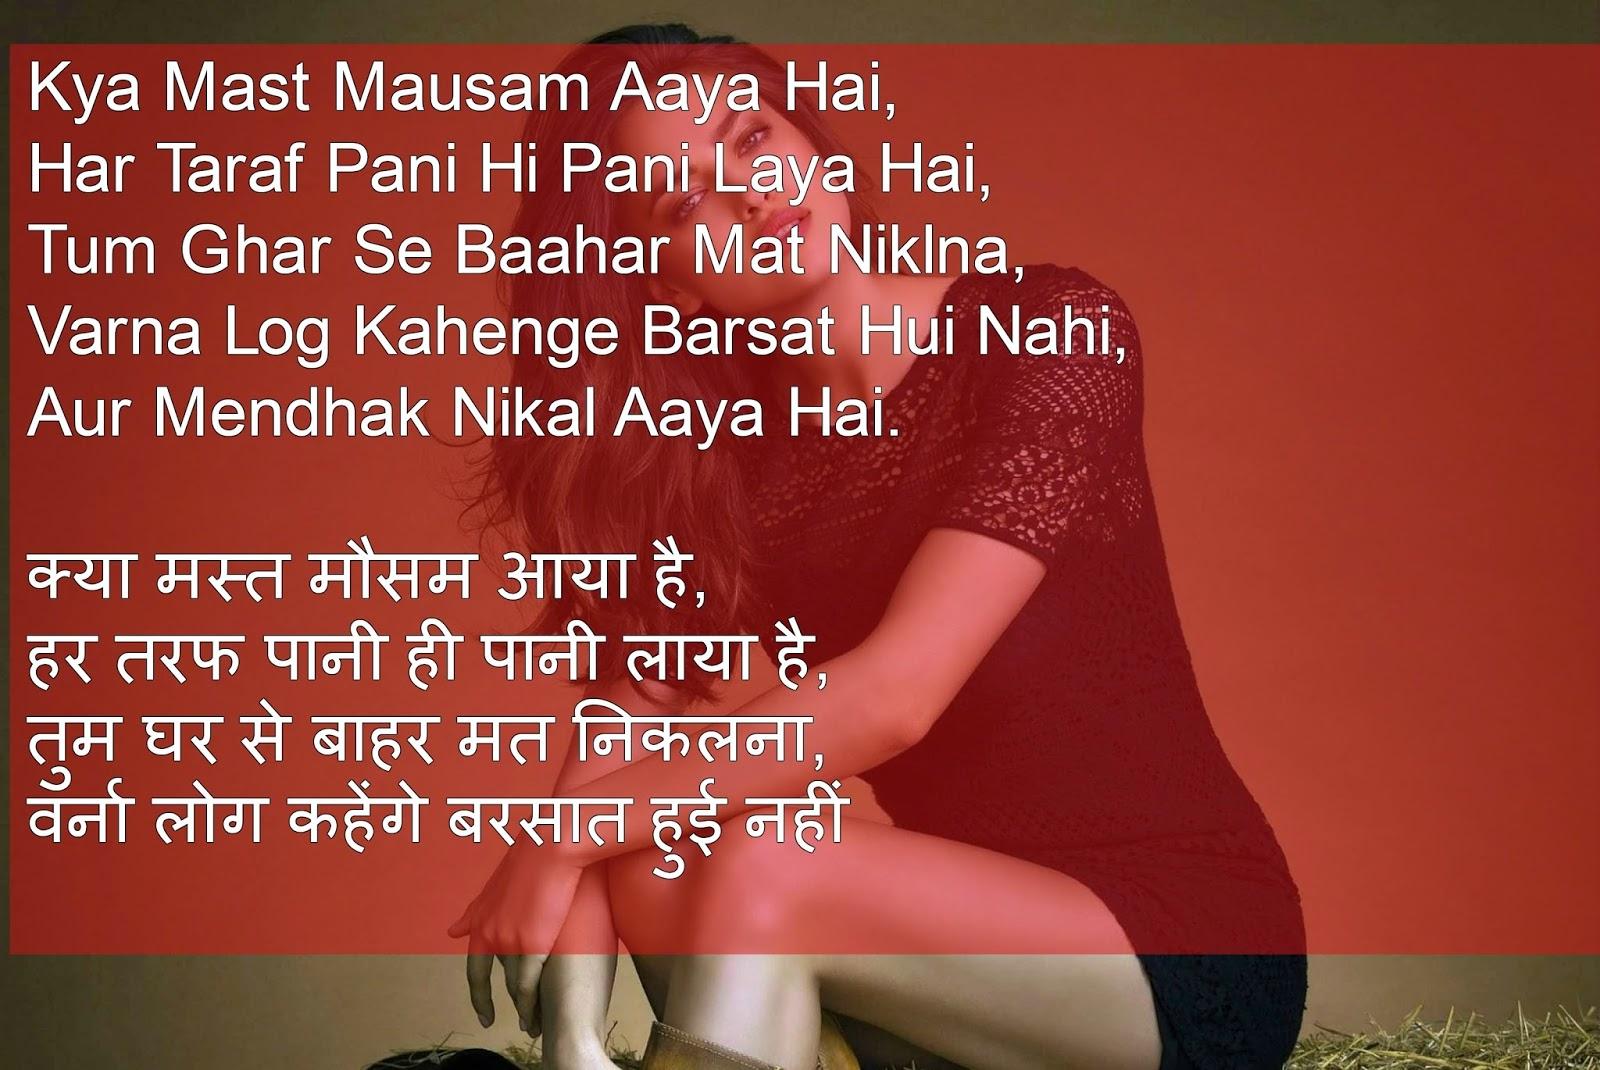 wedding anniversary wishes shayari in hindi%0A  insult shayari in hindi  Images download      beizzati shayari in hindi ladki  insult shayari best insult sms in hindi bezati shayari abusive shayari in